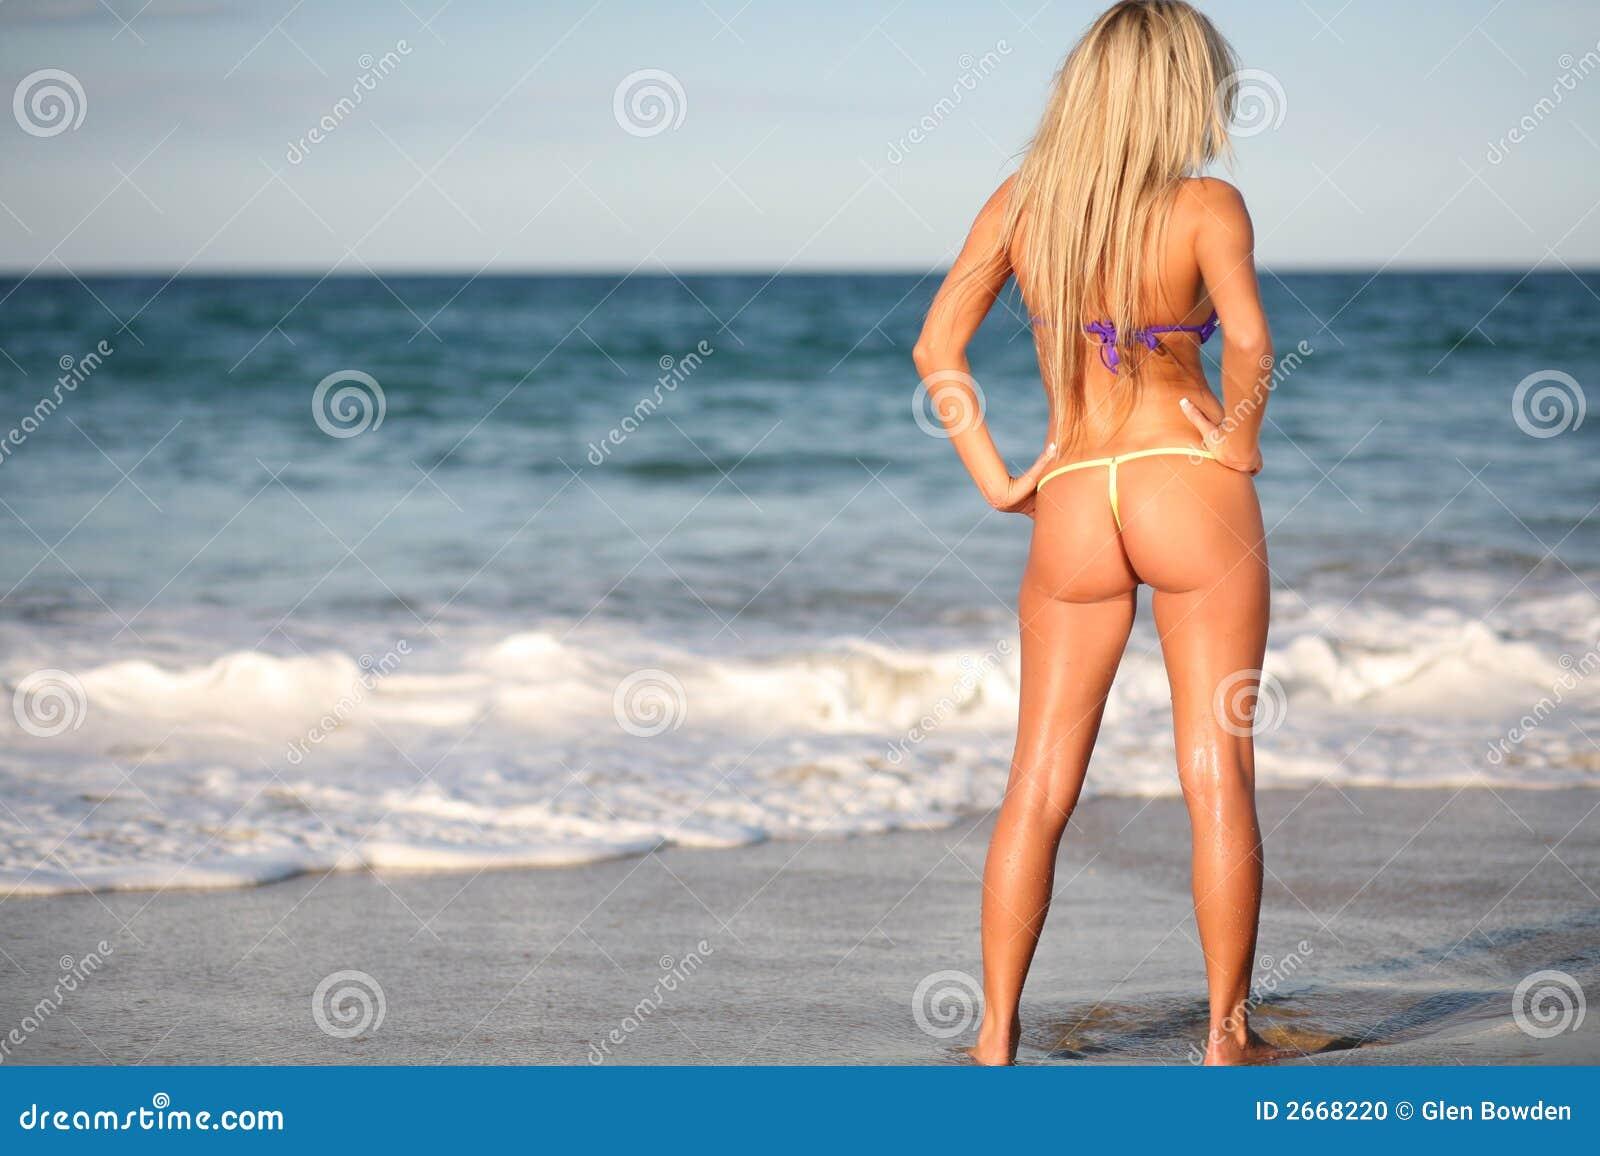 Blond bikinimodel op strand